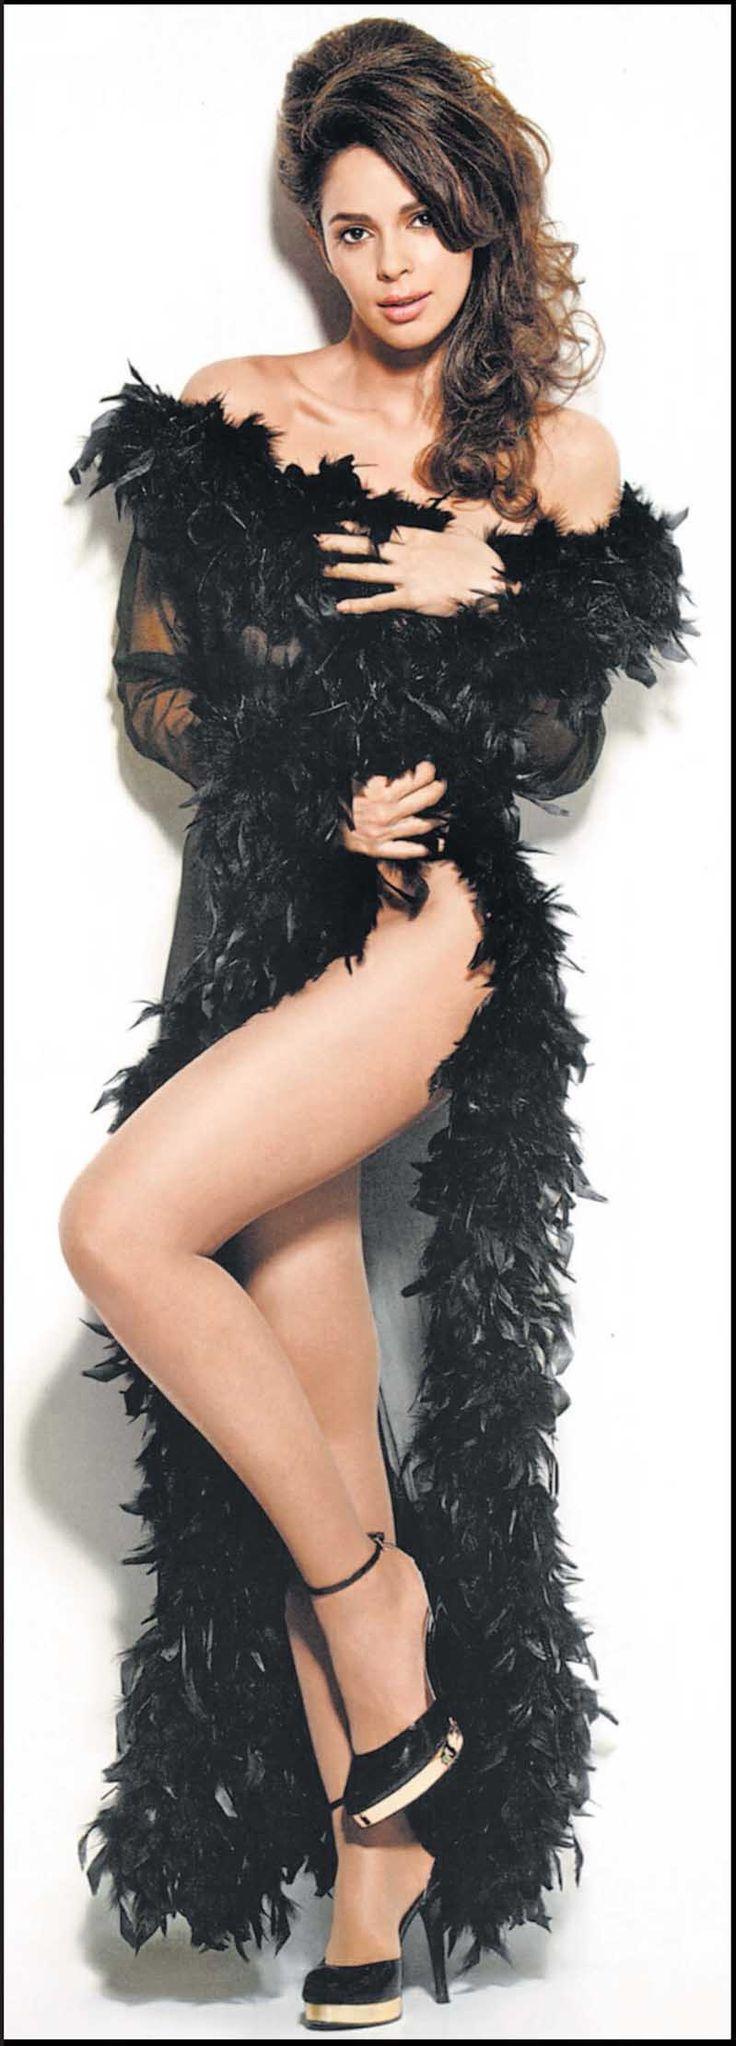 153 best mallika sherawat images on pinterest | bollywood actress